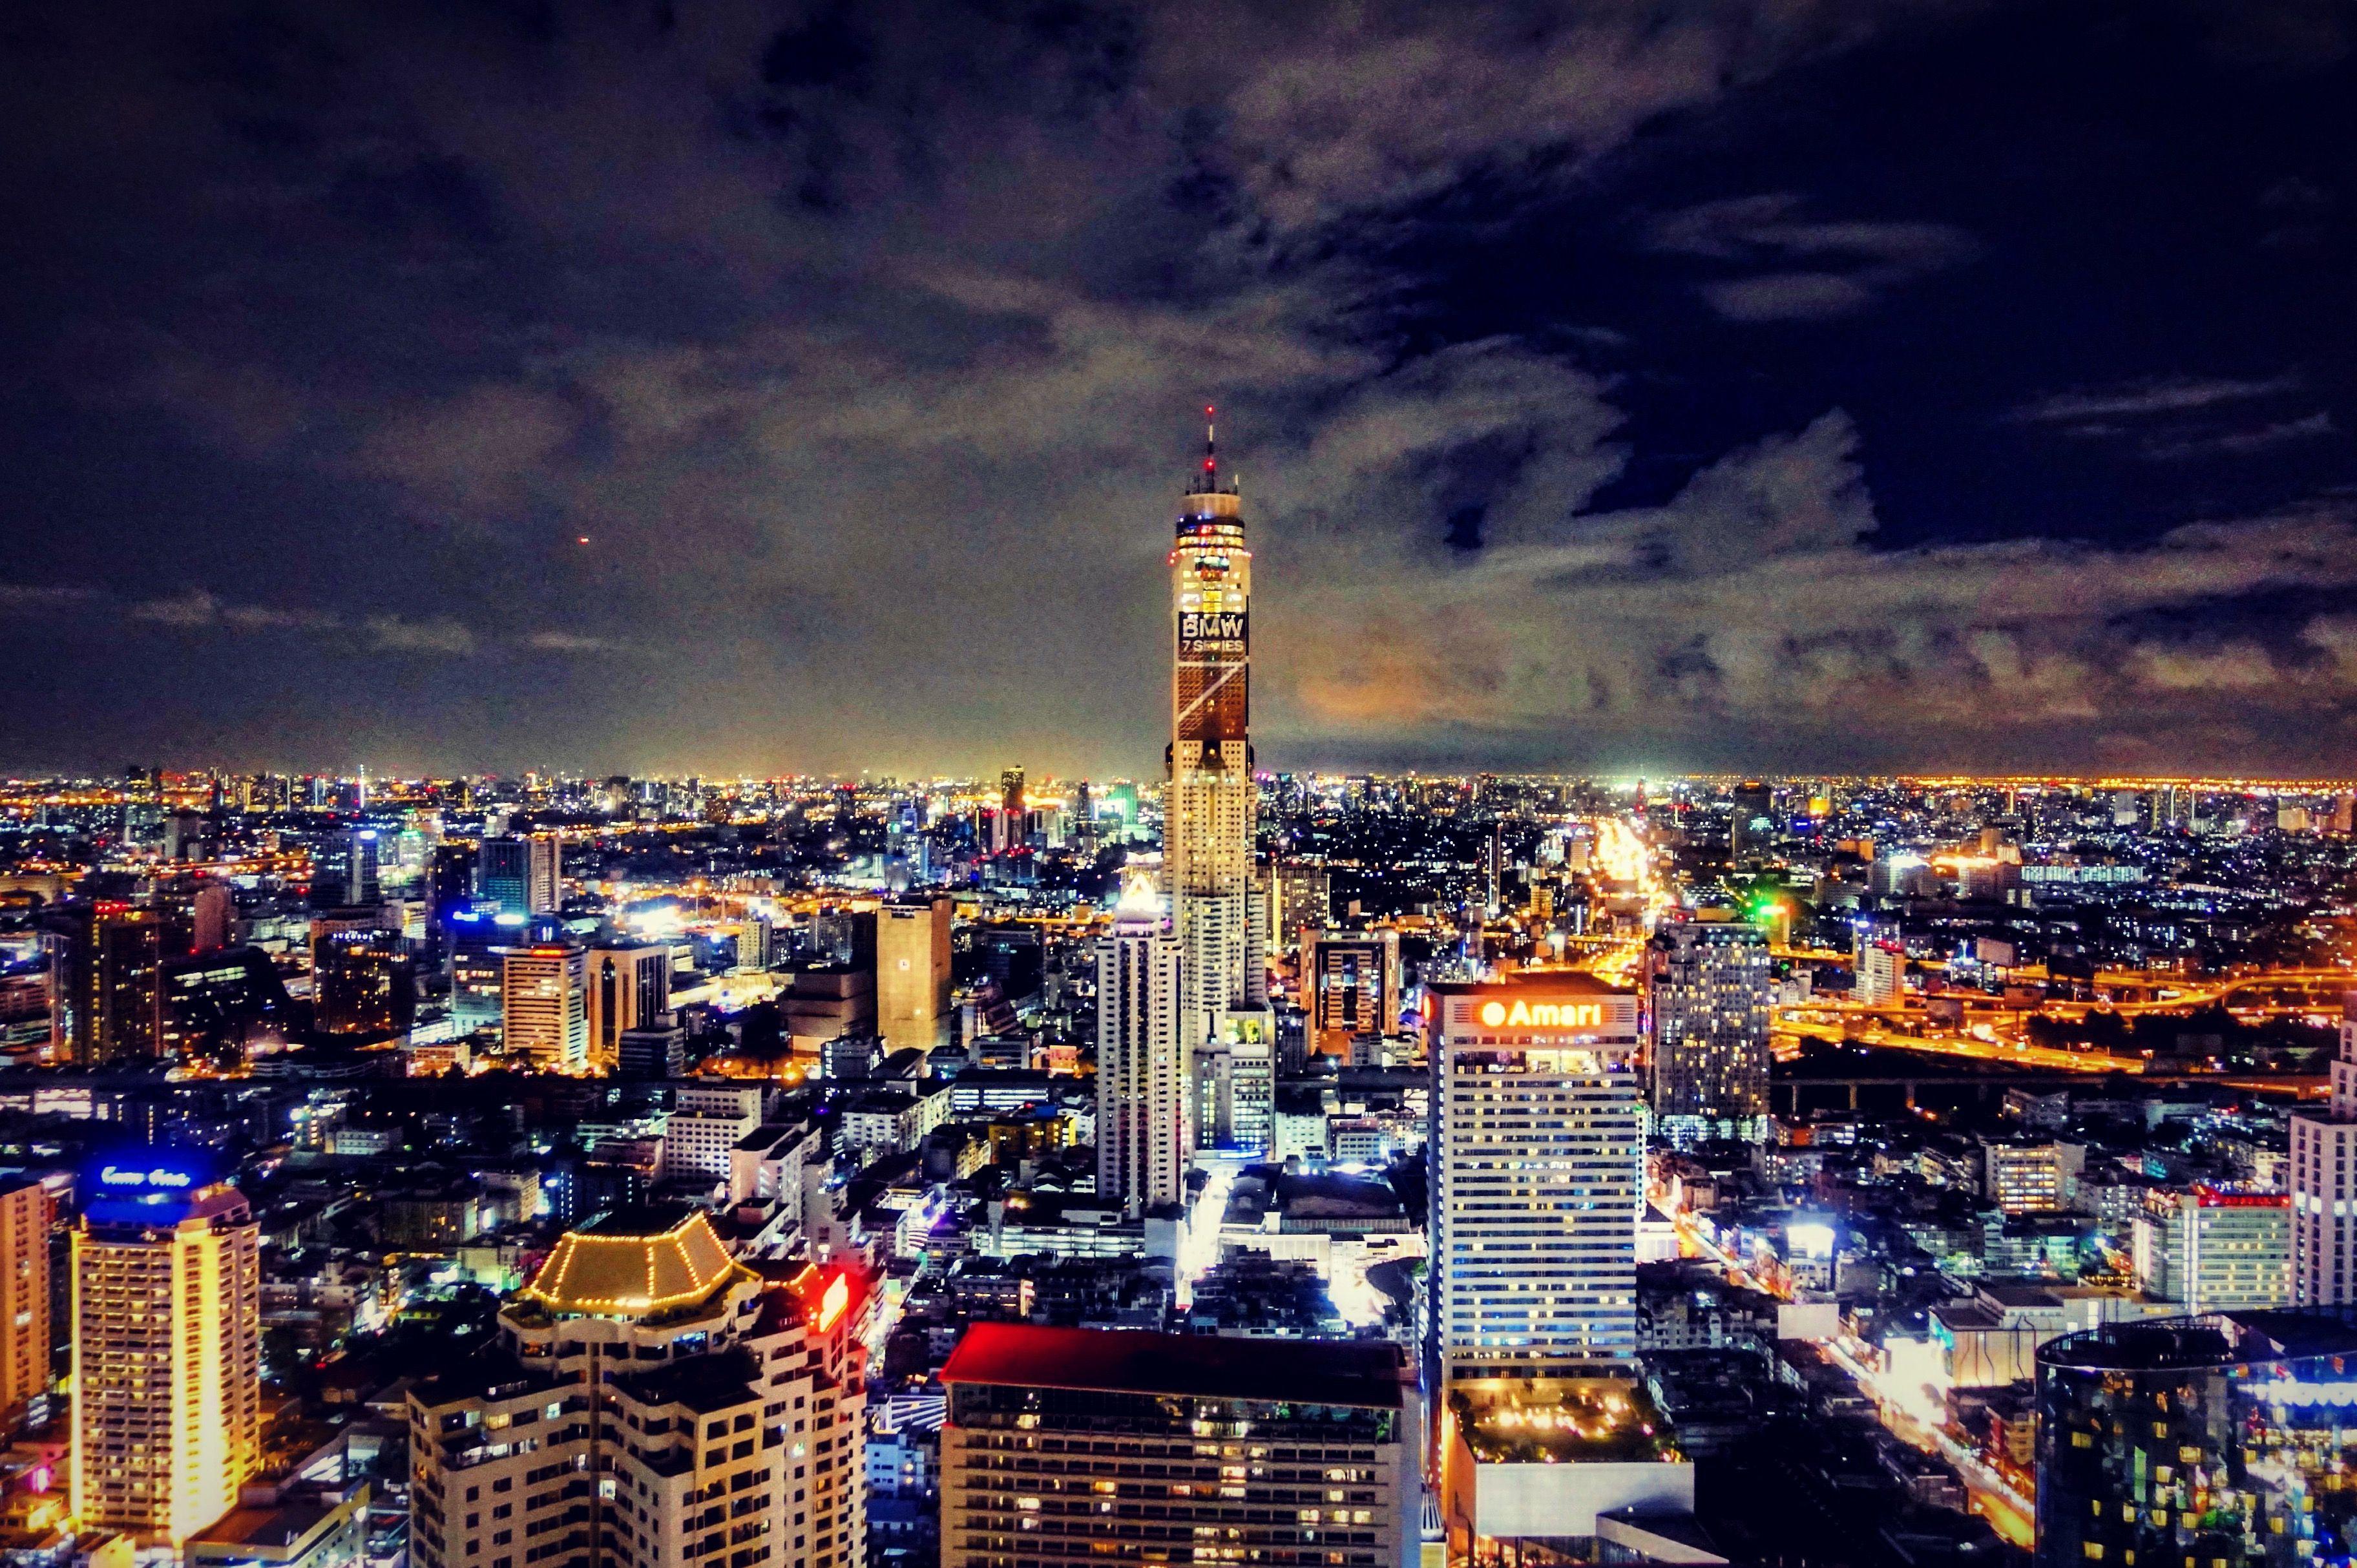 Feel Thailand Deine Feel The World Erlebnisreise Thailand Reisen Bangkok Erlebnisreisen